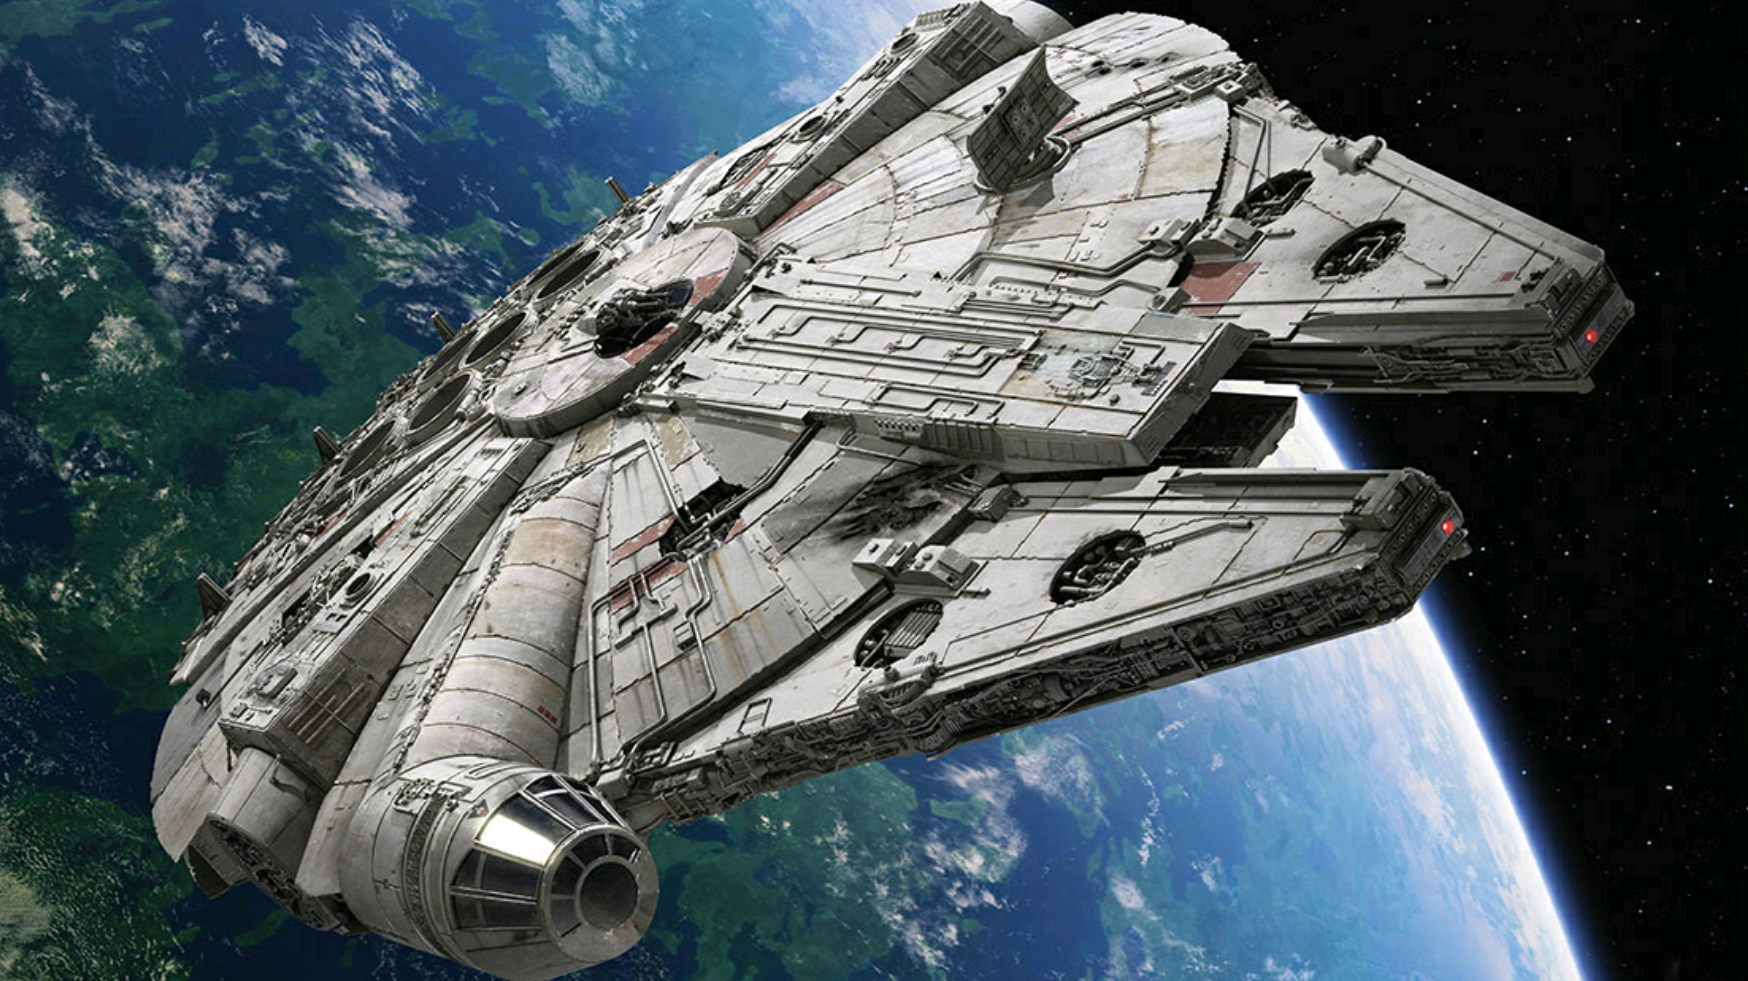 star wars s millennium falcon insurance costs mental floss. Black Bedroom Furniture Sets. Home Design Ideas